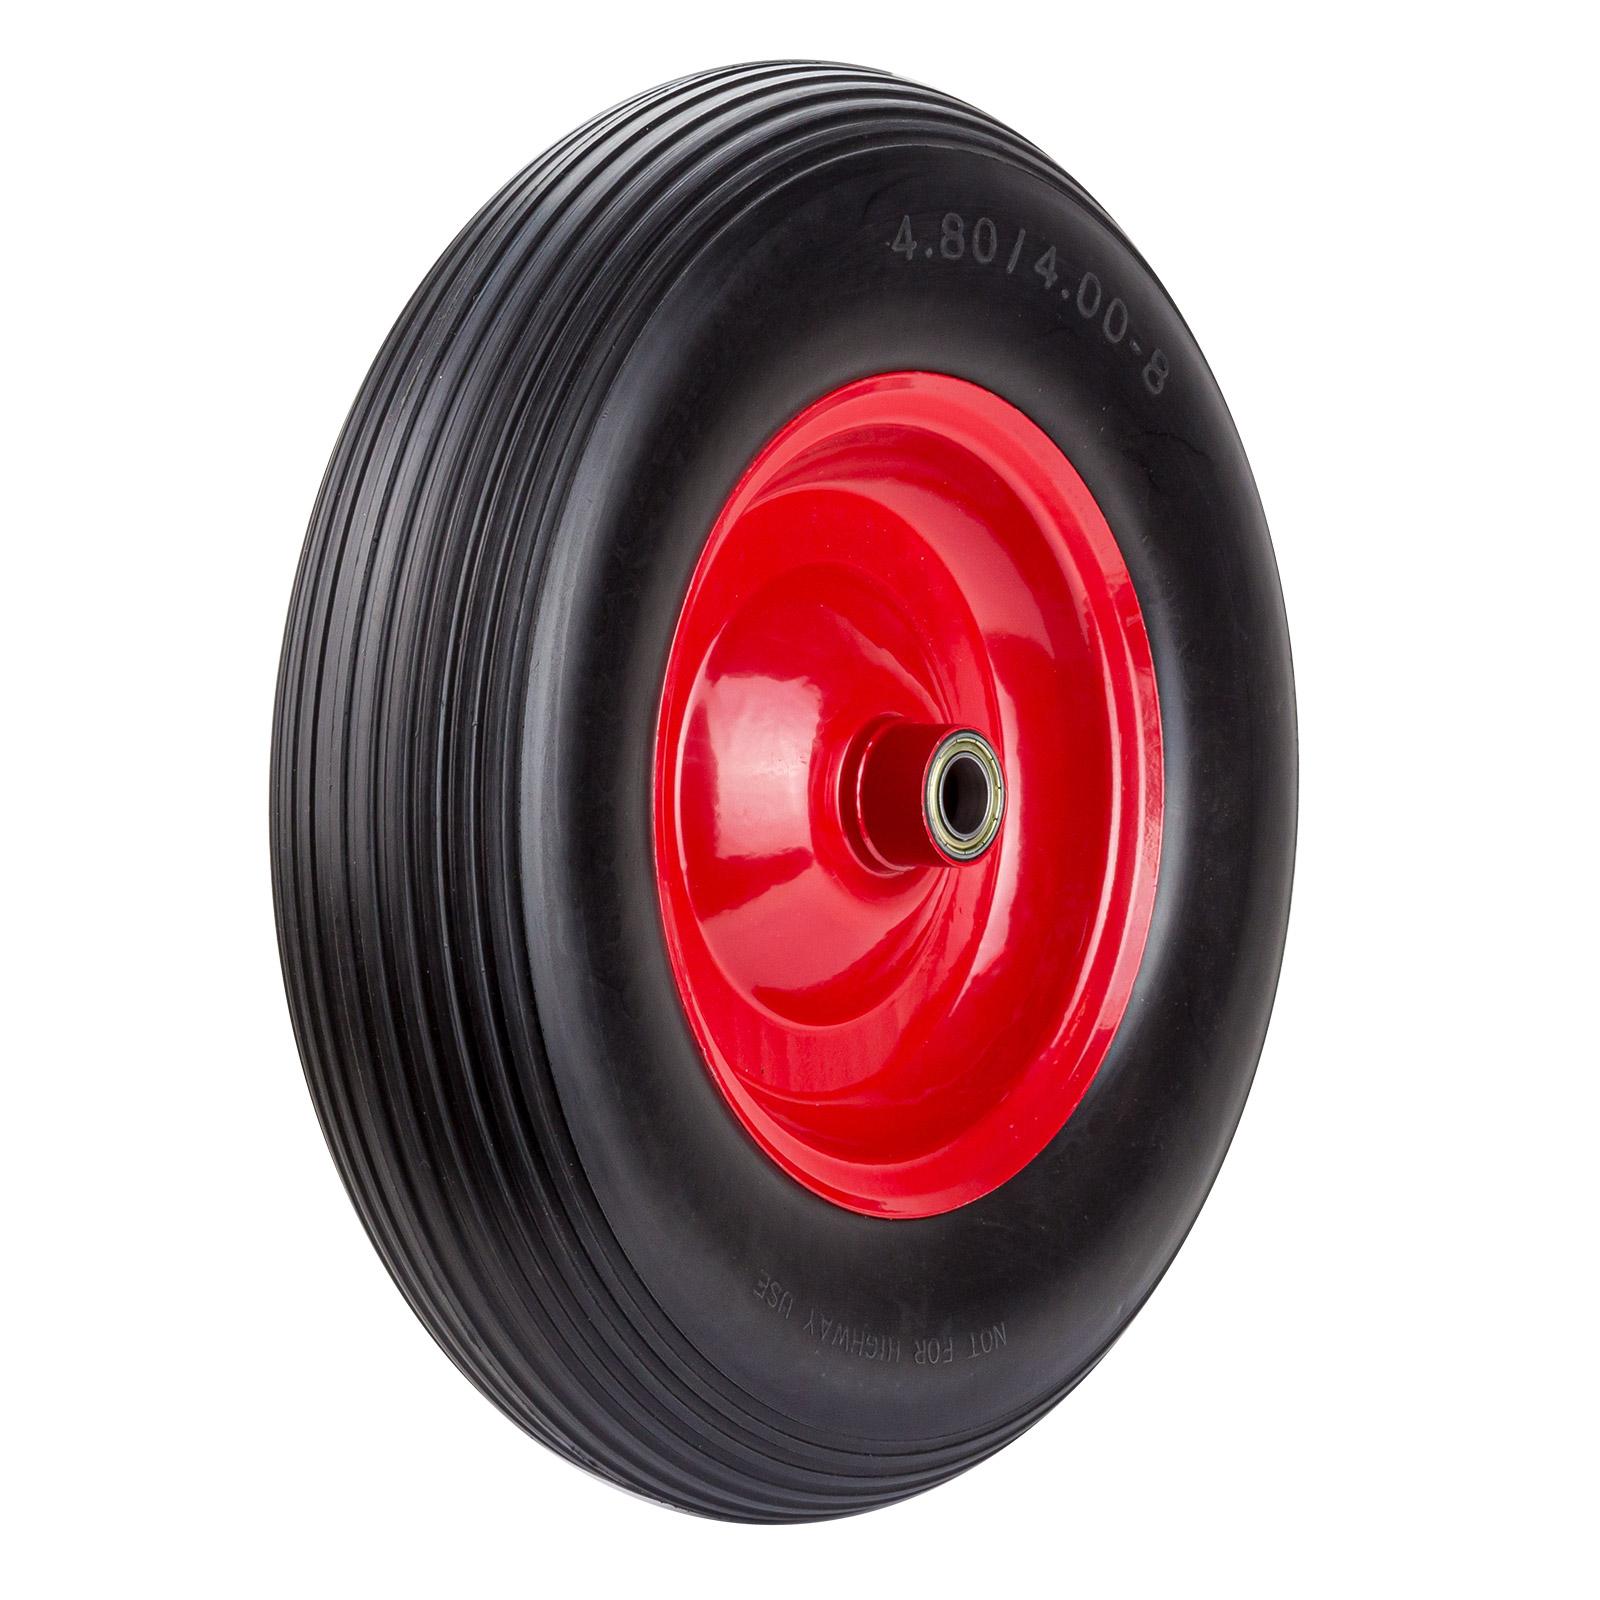 Dema PU Luft Schubkarrenrad Sackkarrenrad Ersatzrad Reifen Rad var-rad